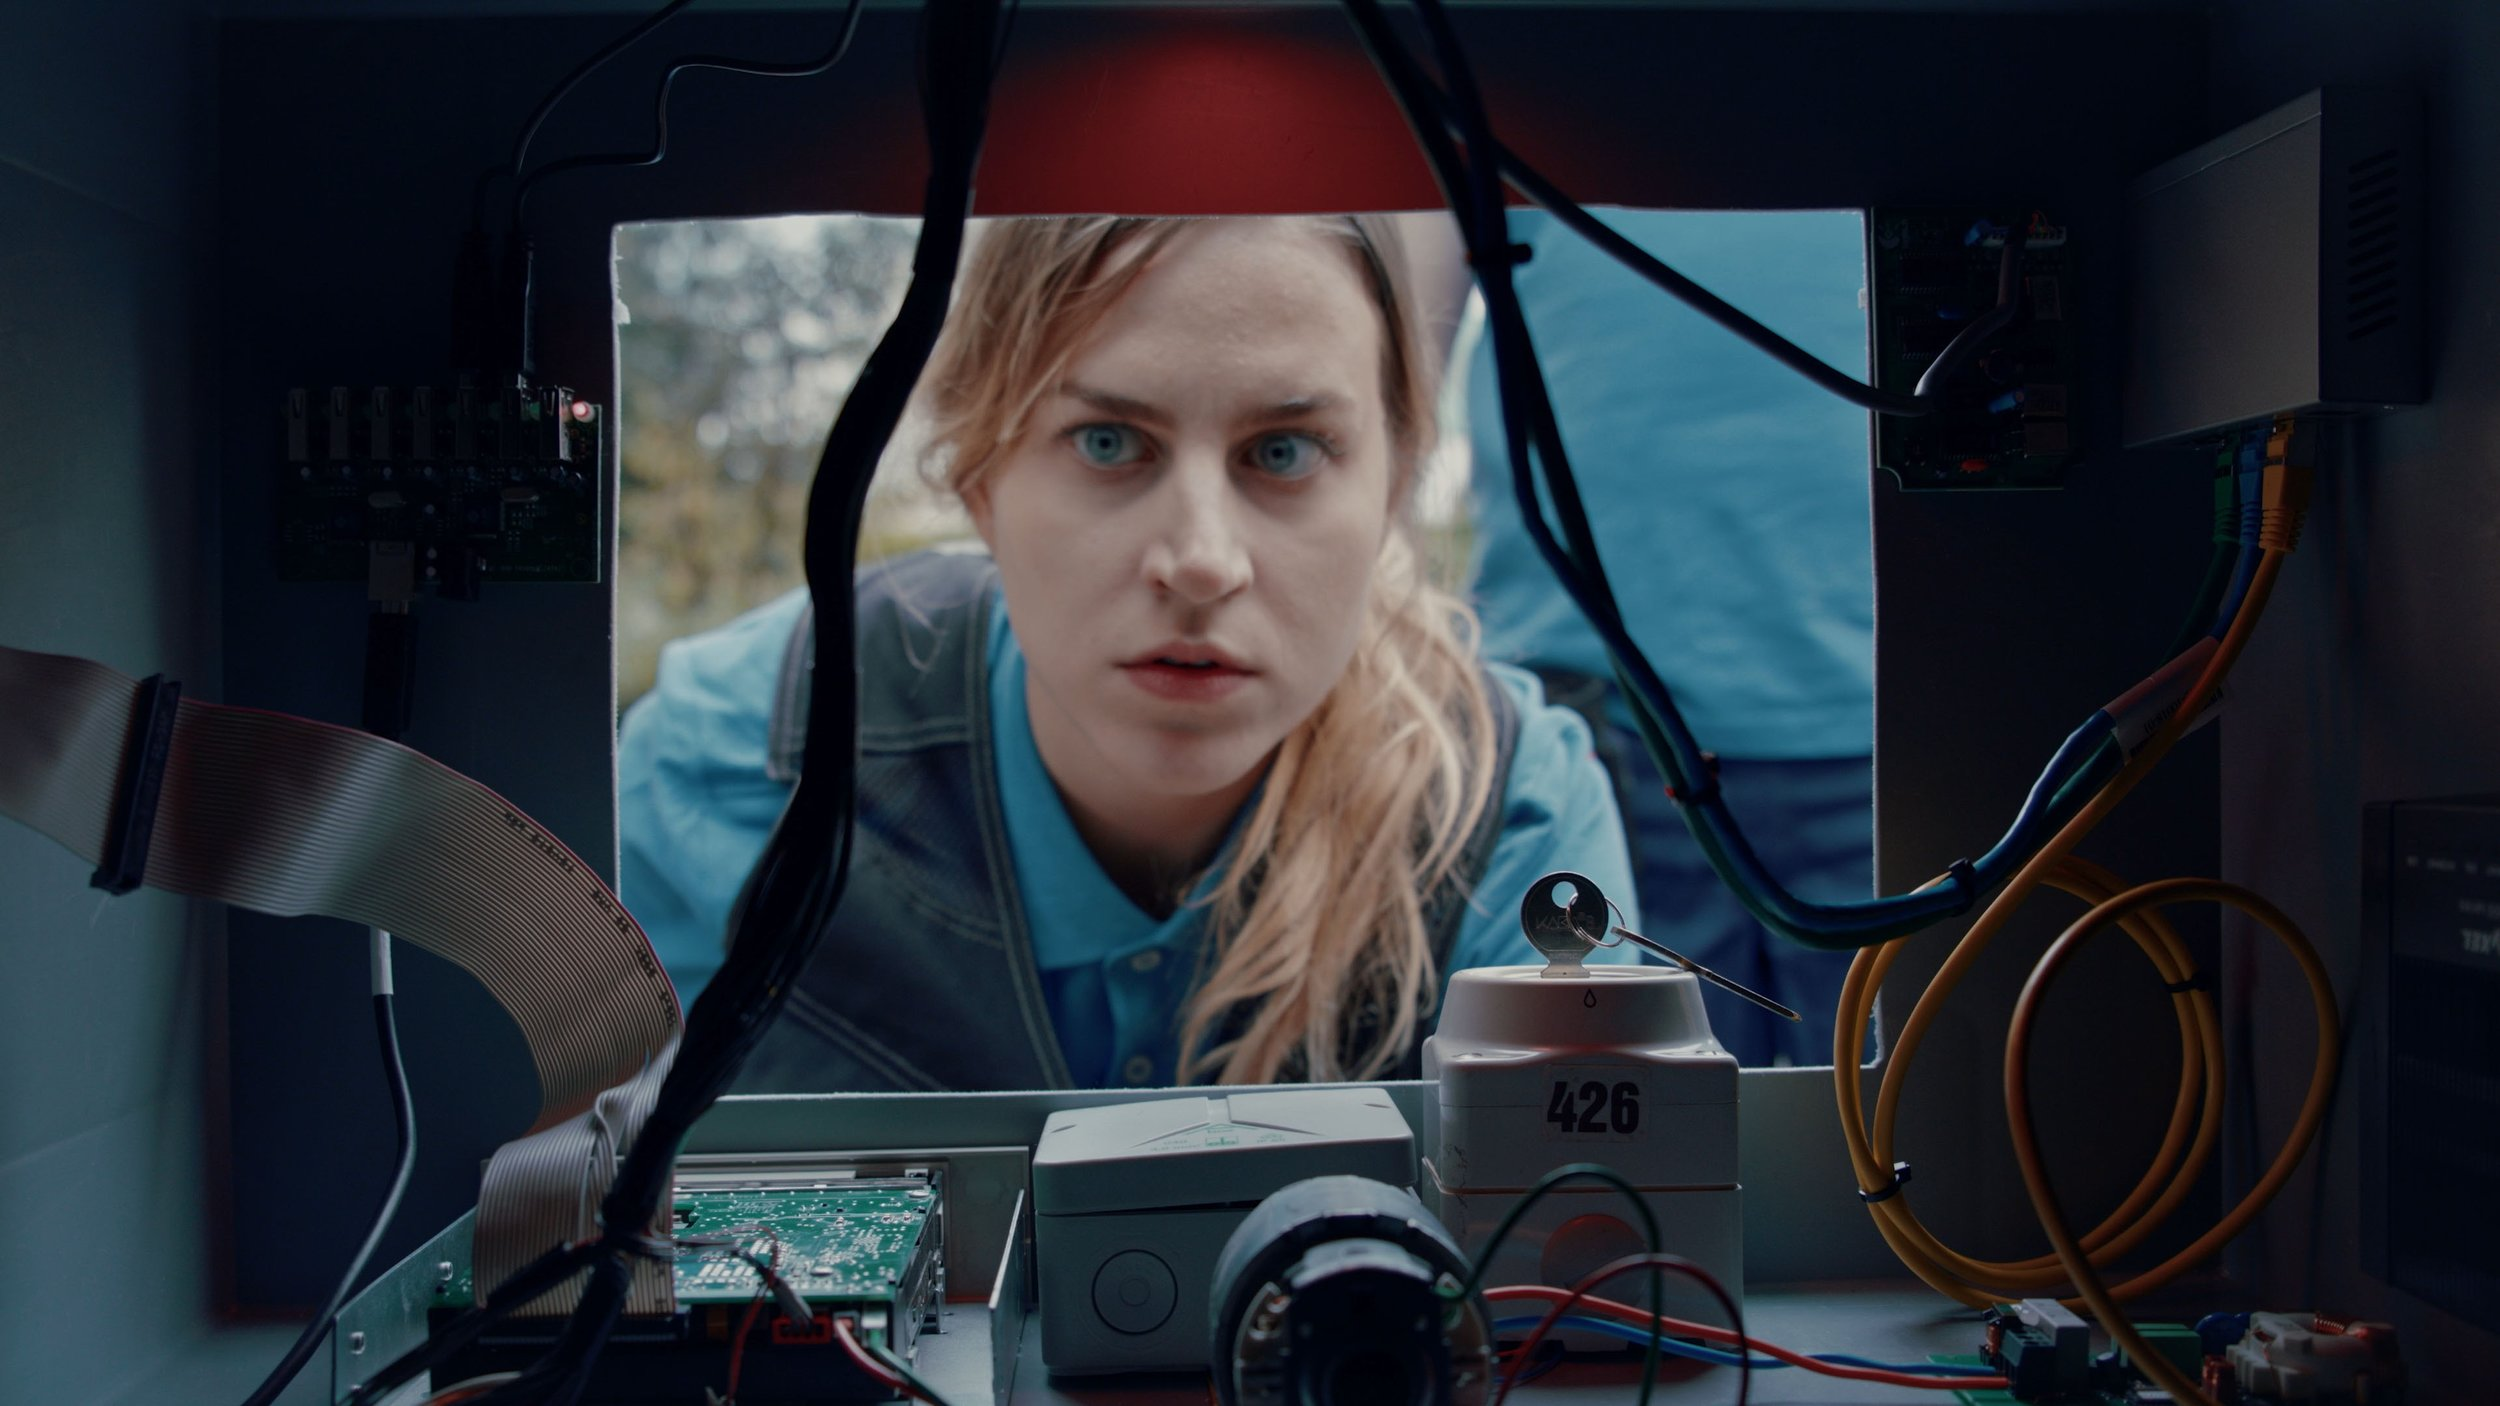 WIRED - Award winning 72 second short film